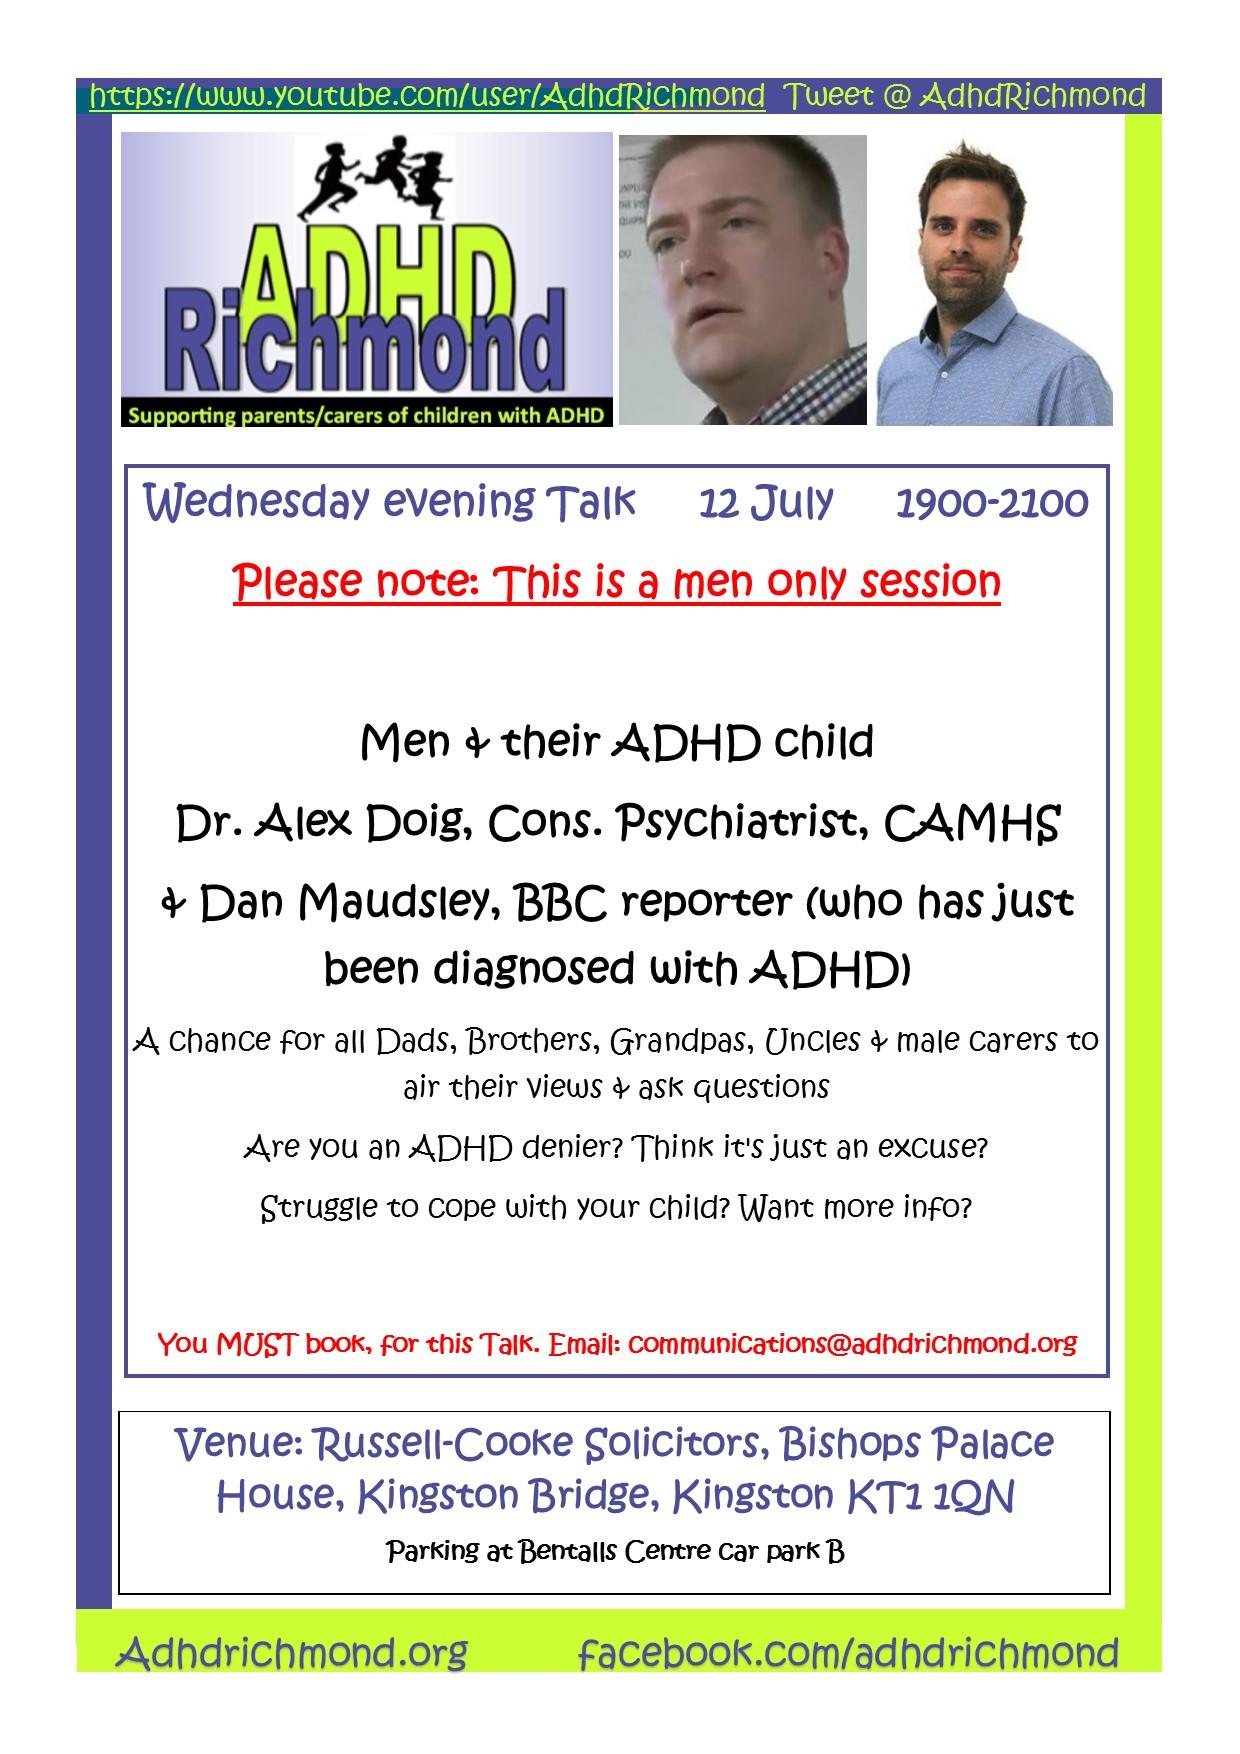 July 12 eve Talk